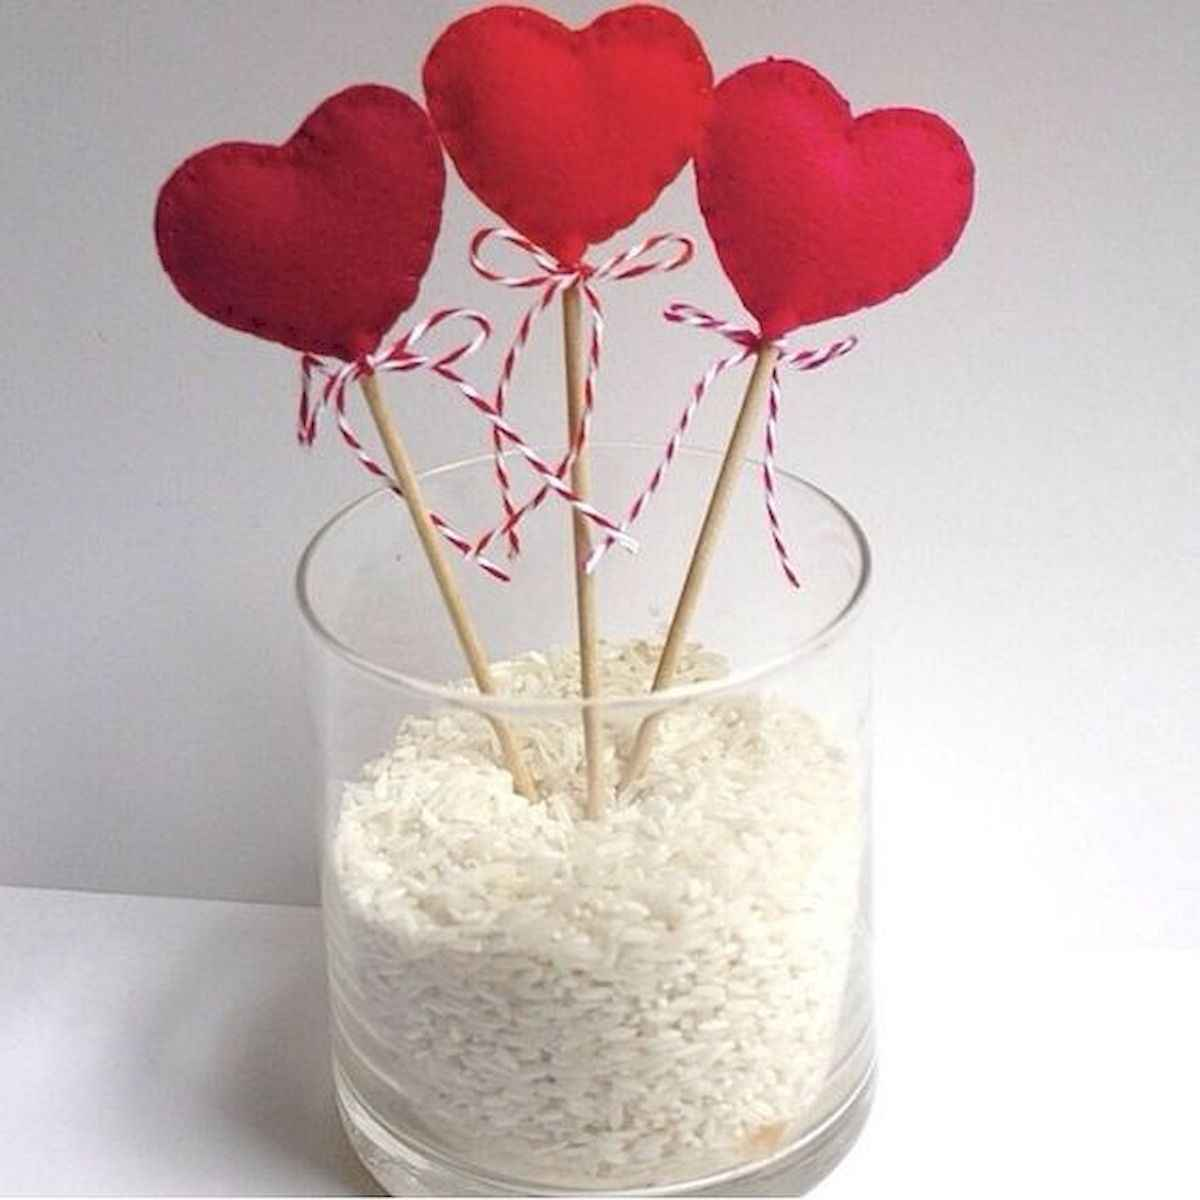 50 stunning valentines day decor ideas (45)